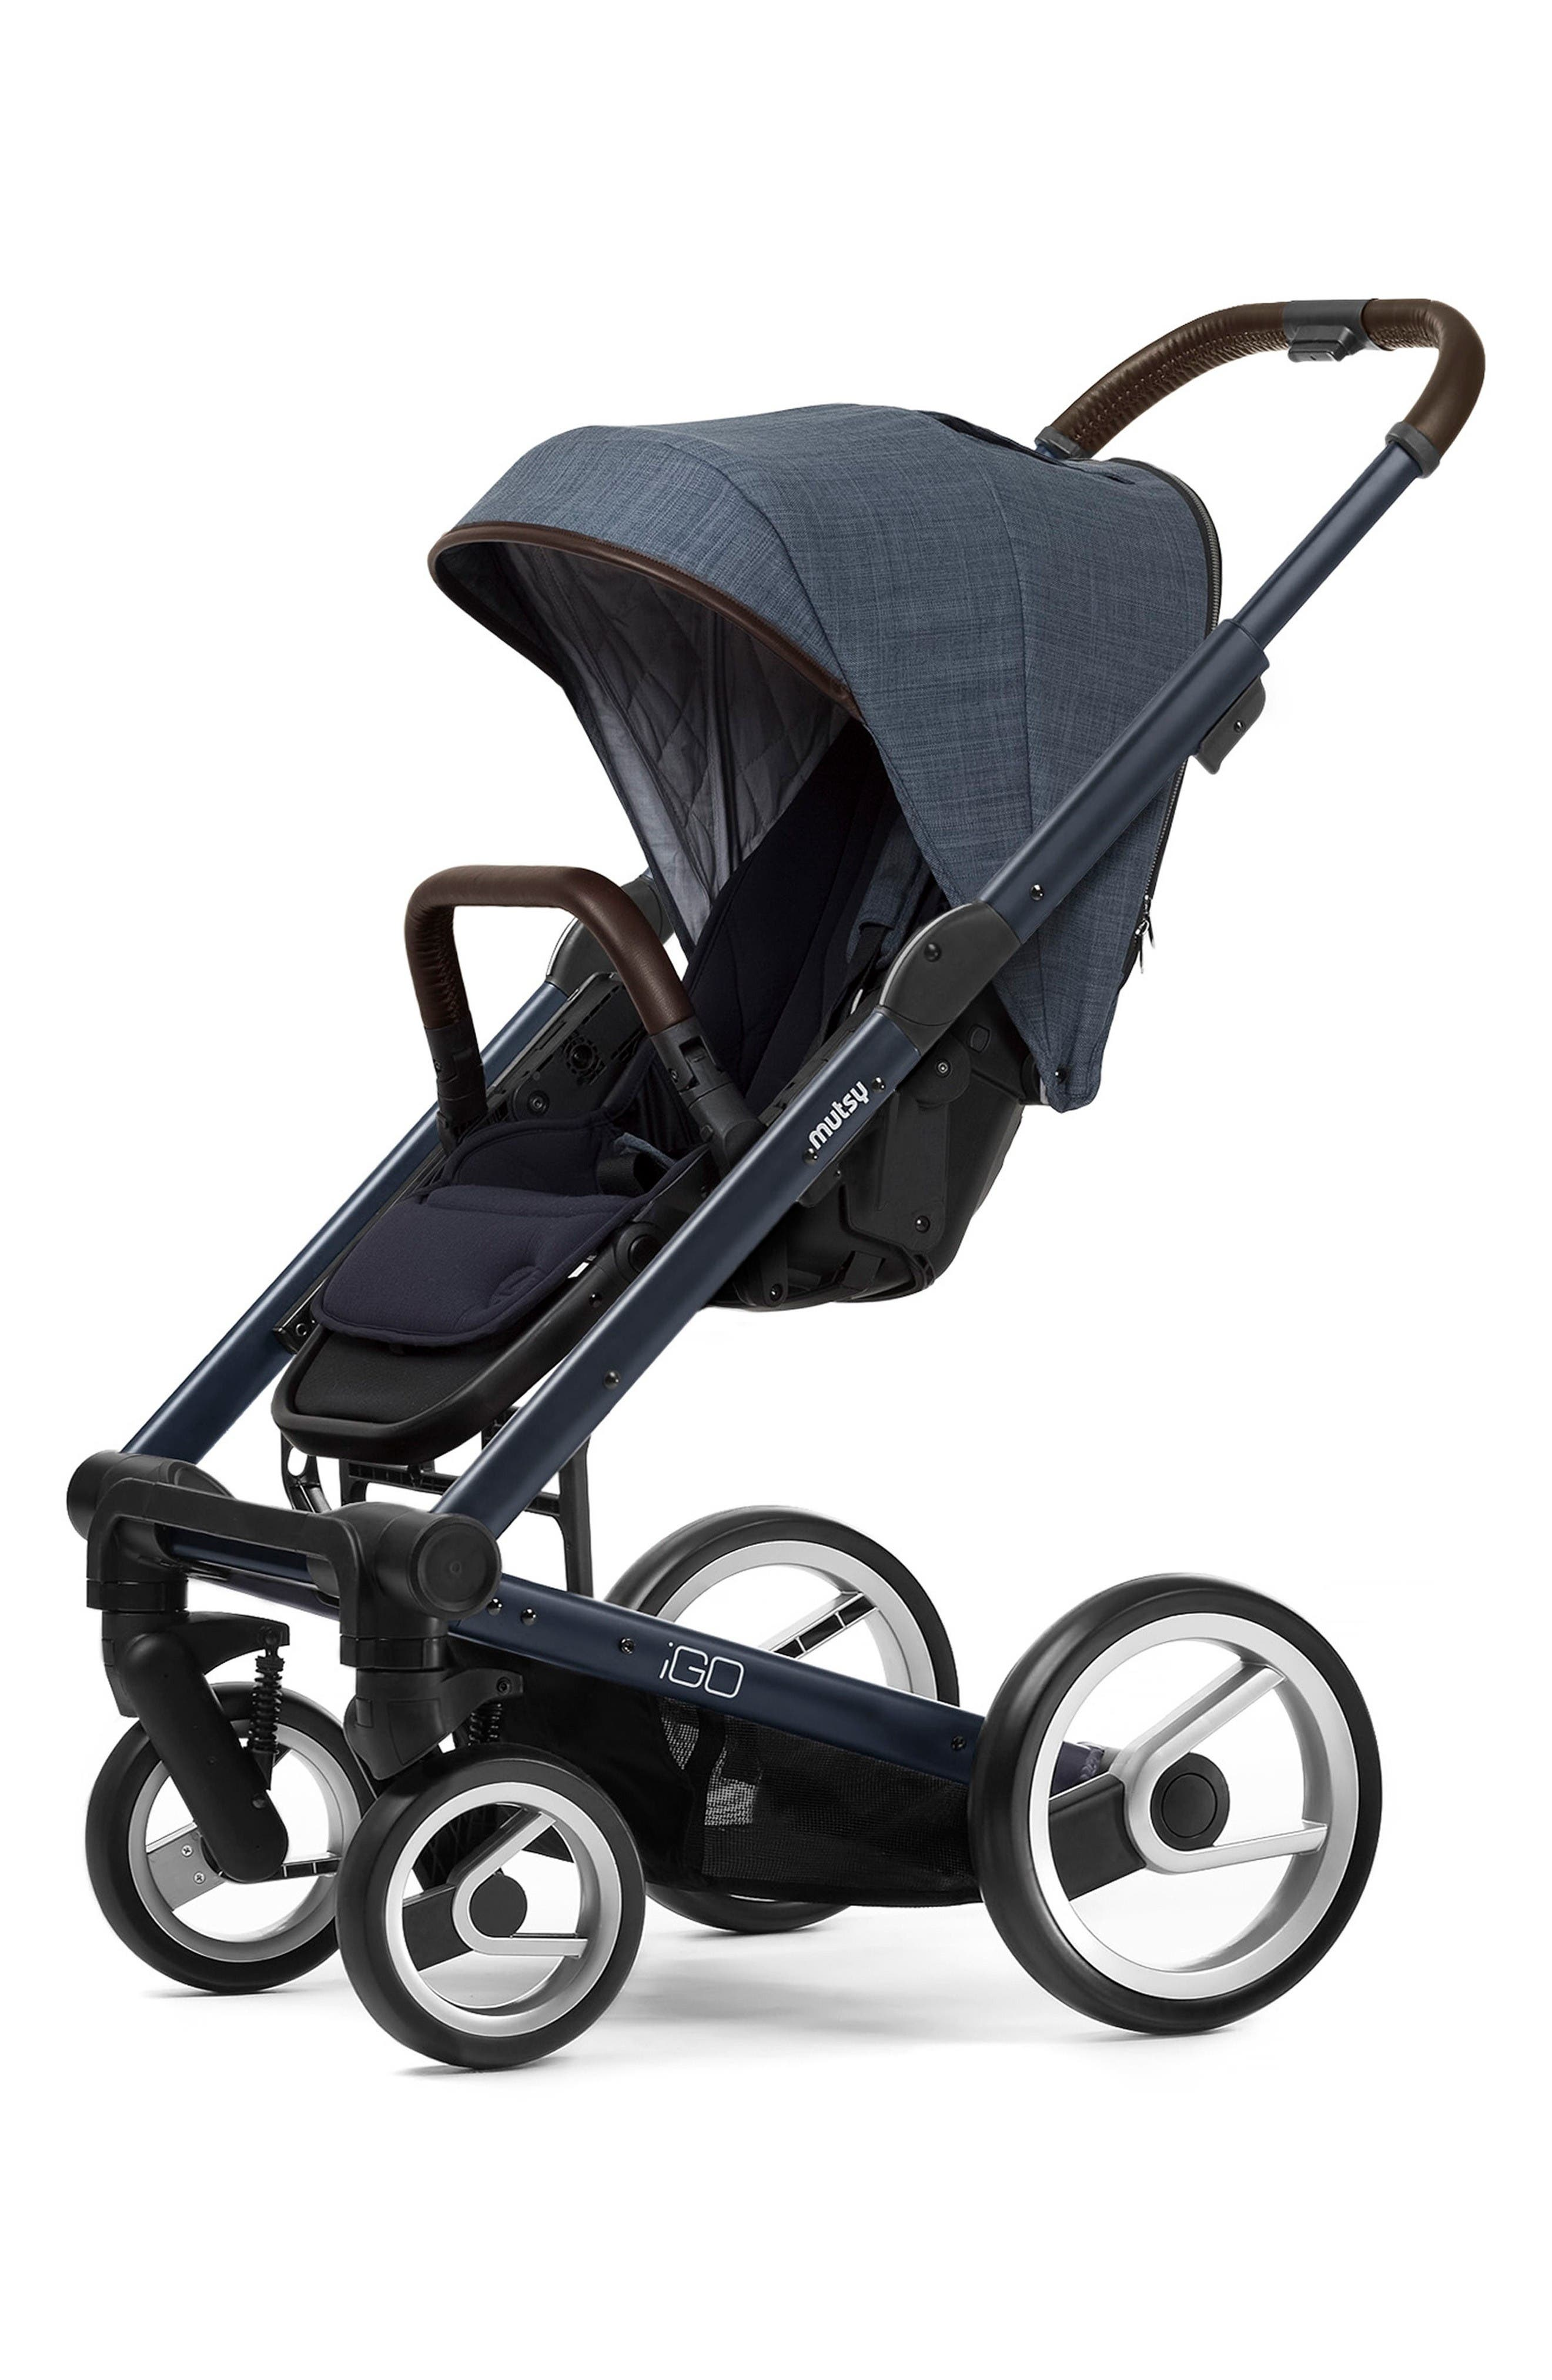 Igo - Farmer Earth Stroller,                         Main,                         color, Blue/ Blue